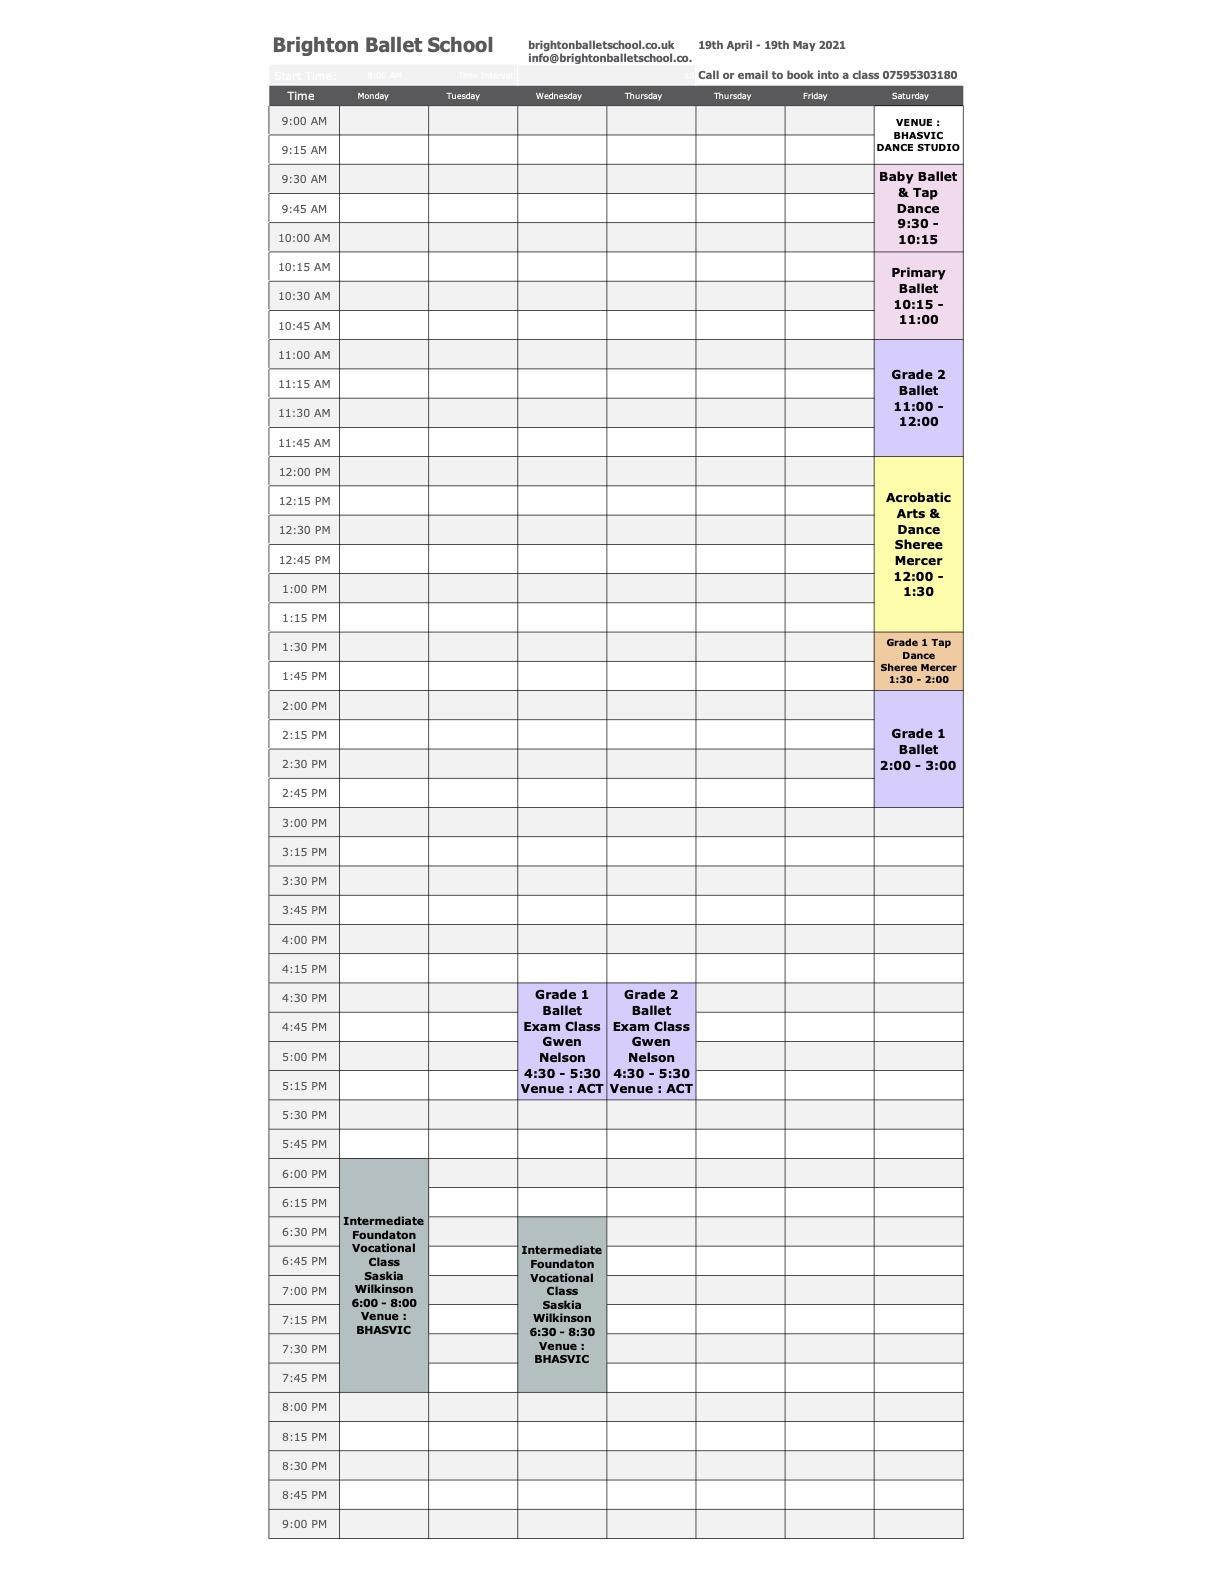 Brighton Ballet School Timetable